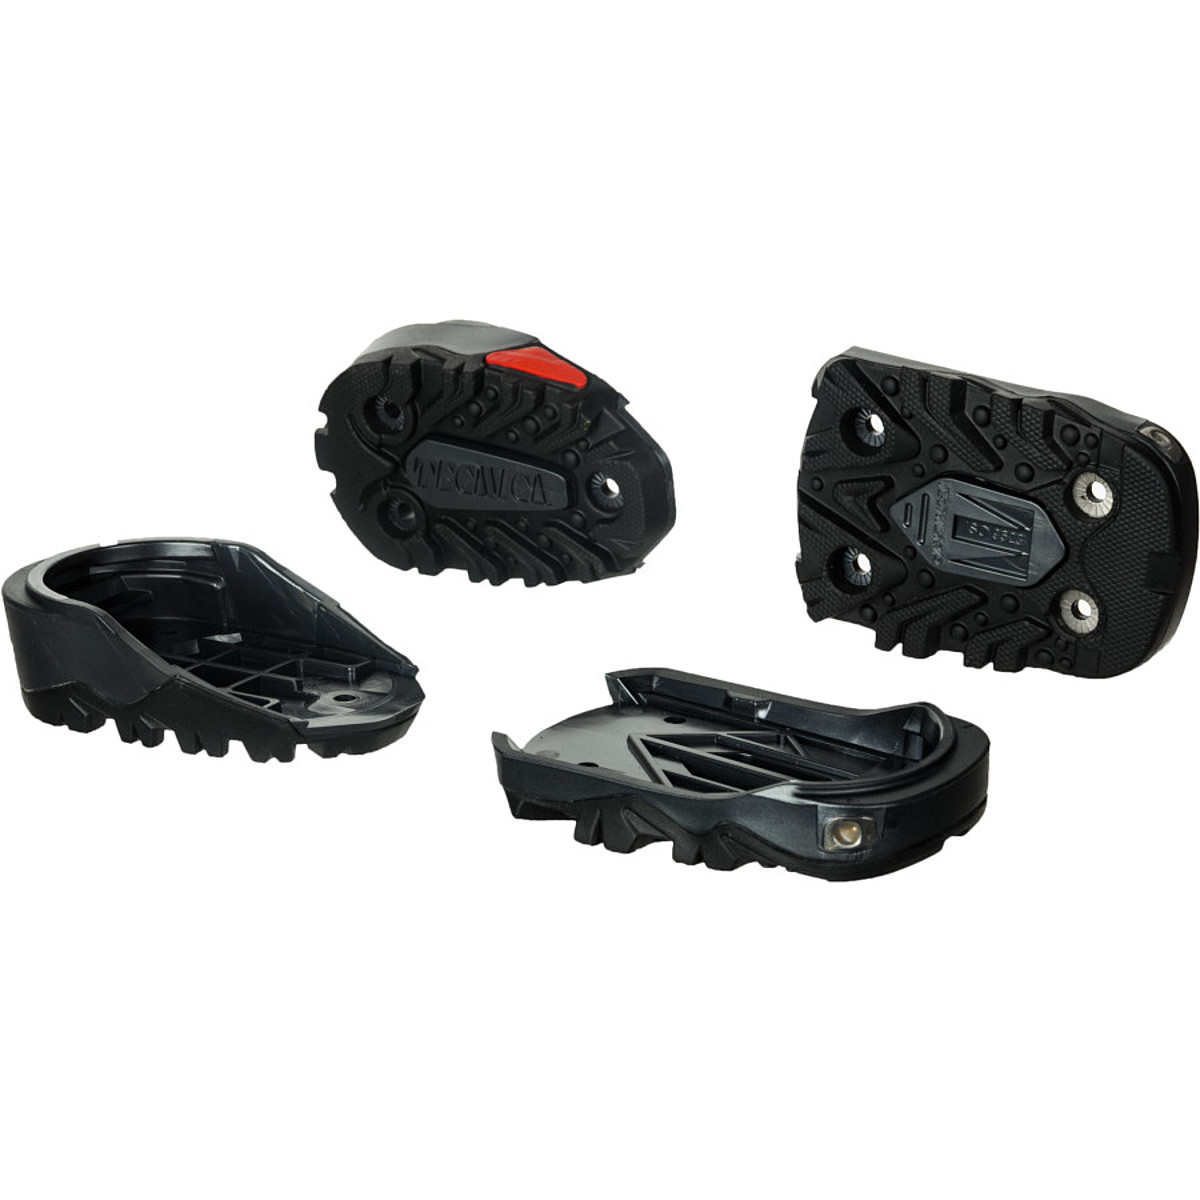 photo: Tecnica Interchangeable Alpine Touring Boot Footprint alpine touring accessory